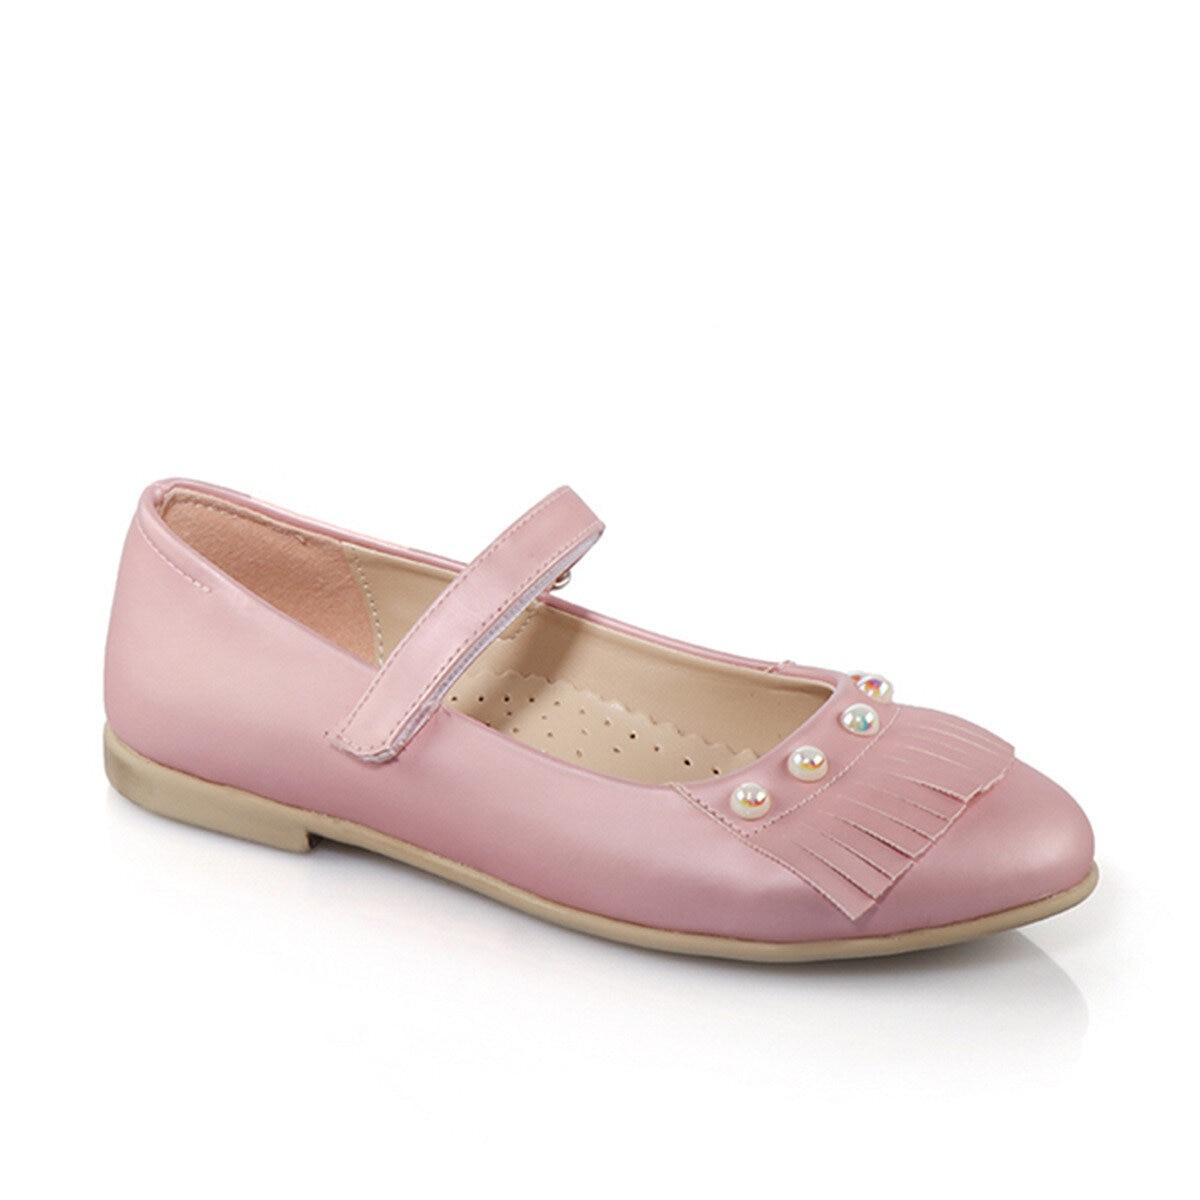 FLO 936.18Y.460 Pink Female Child Ballerina VICCO